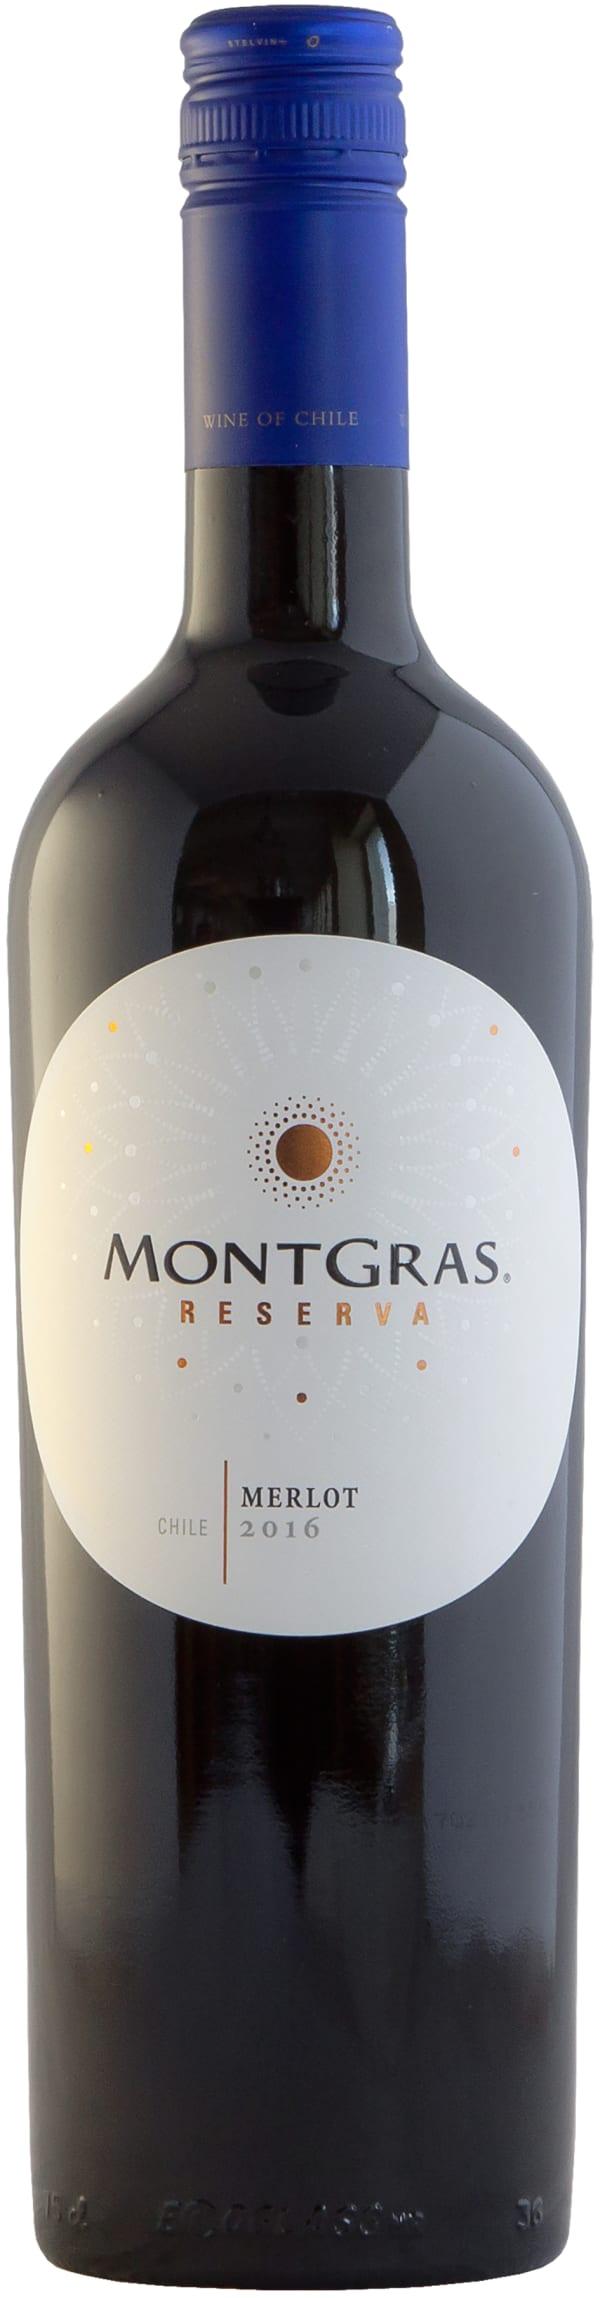 MontGras Merlot Reserva 2015